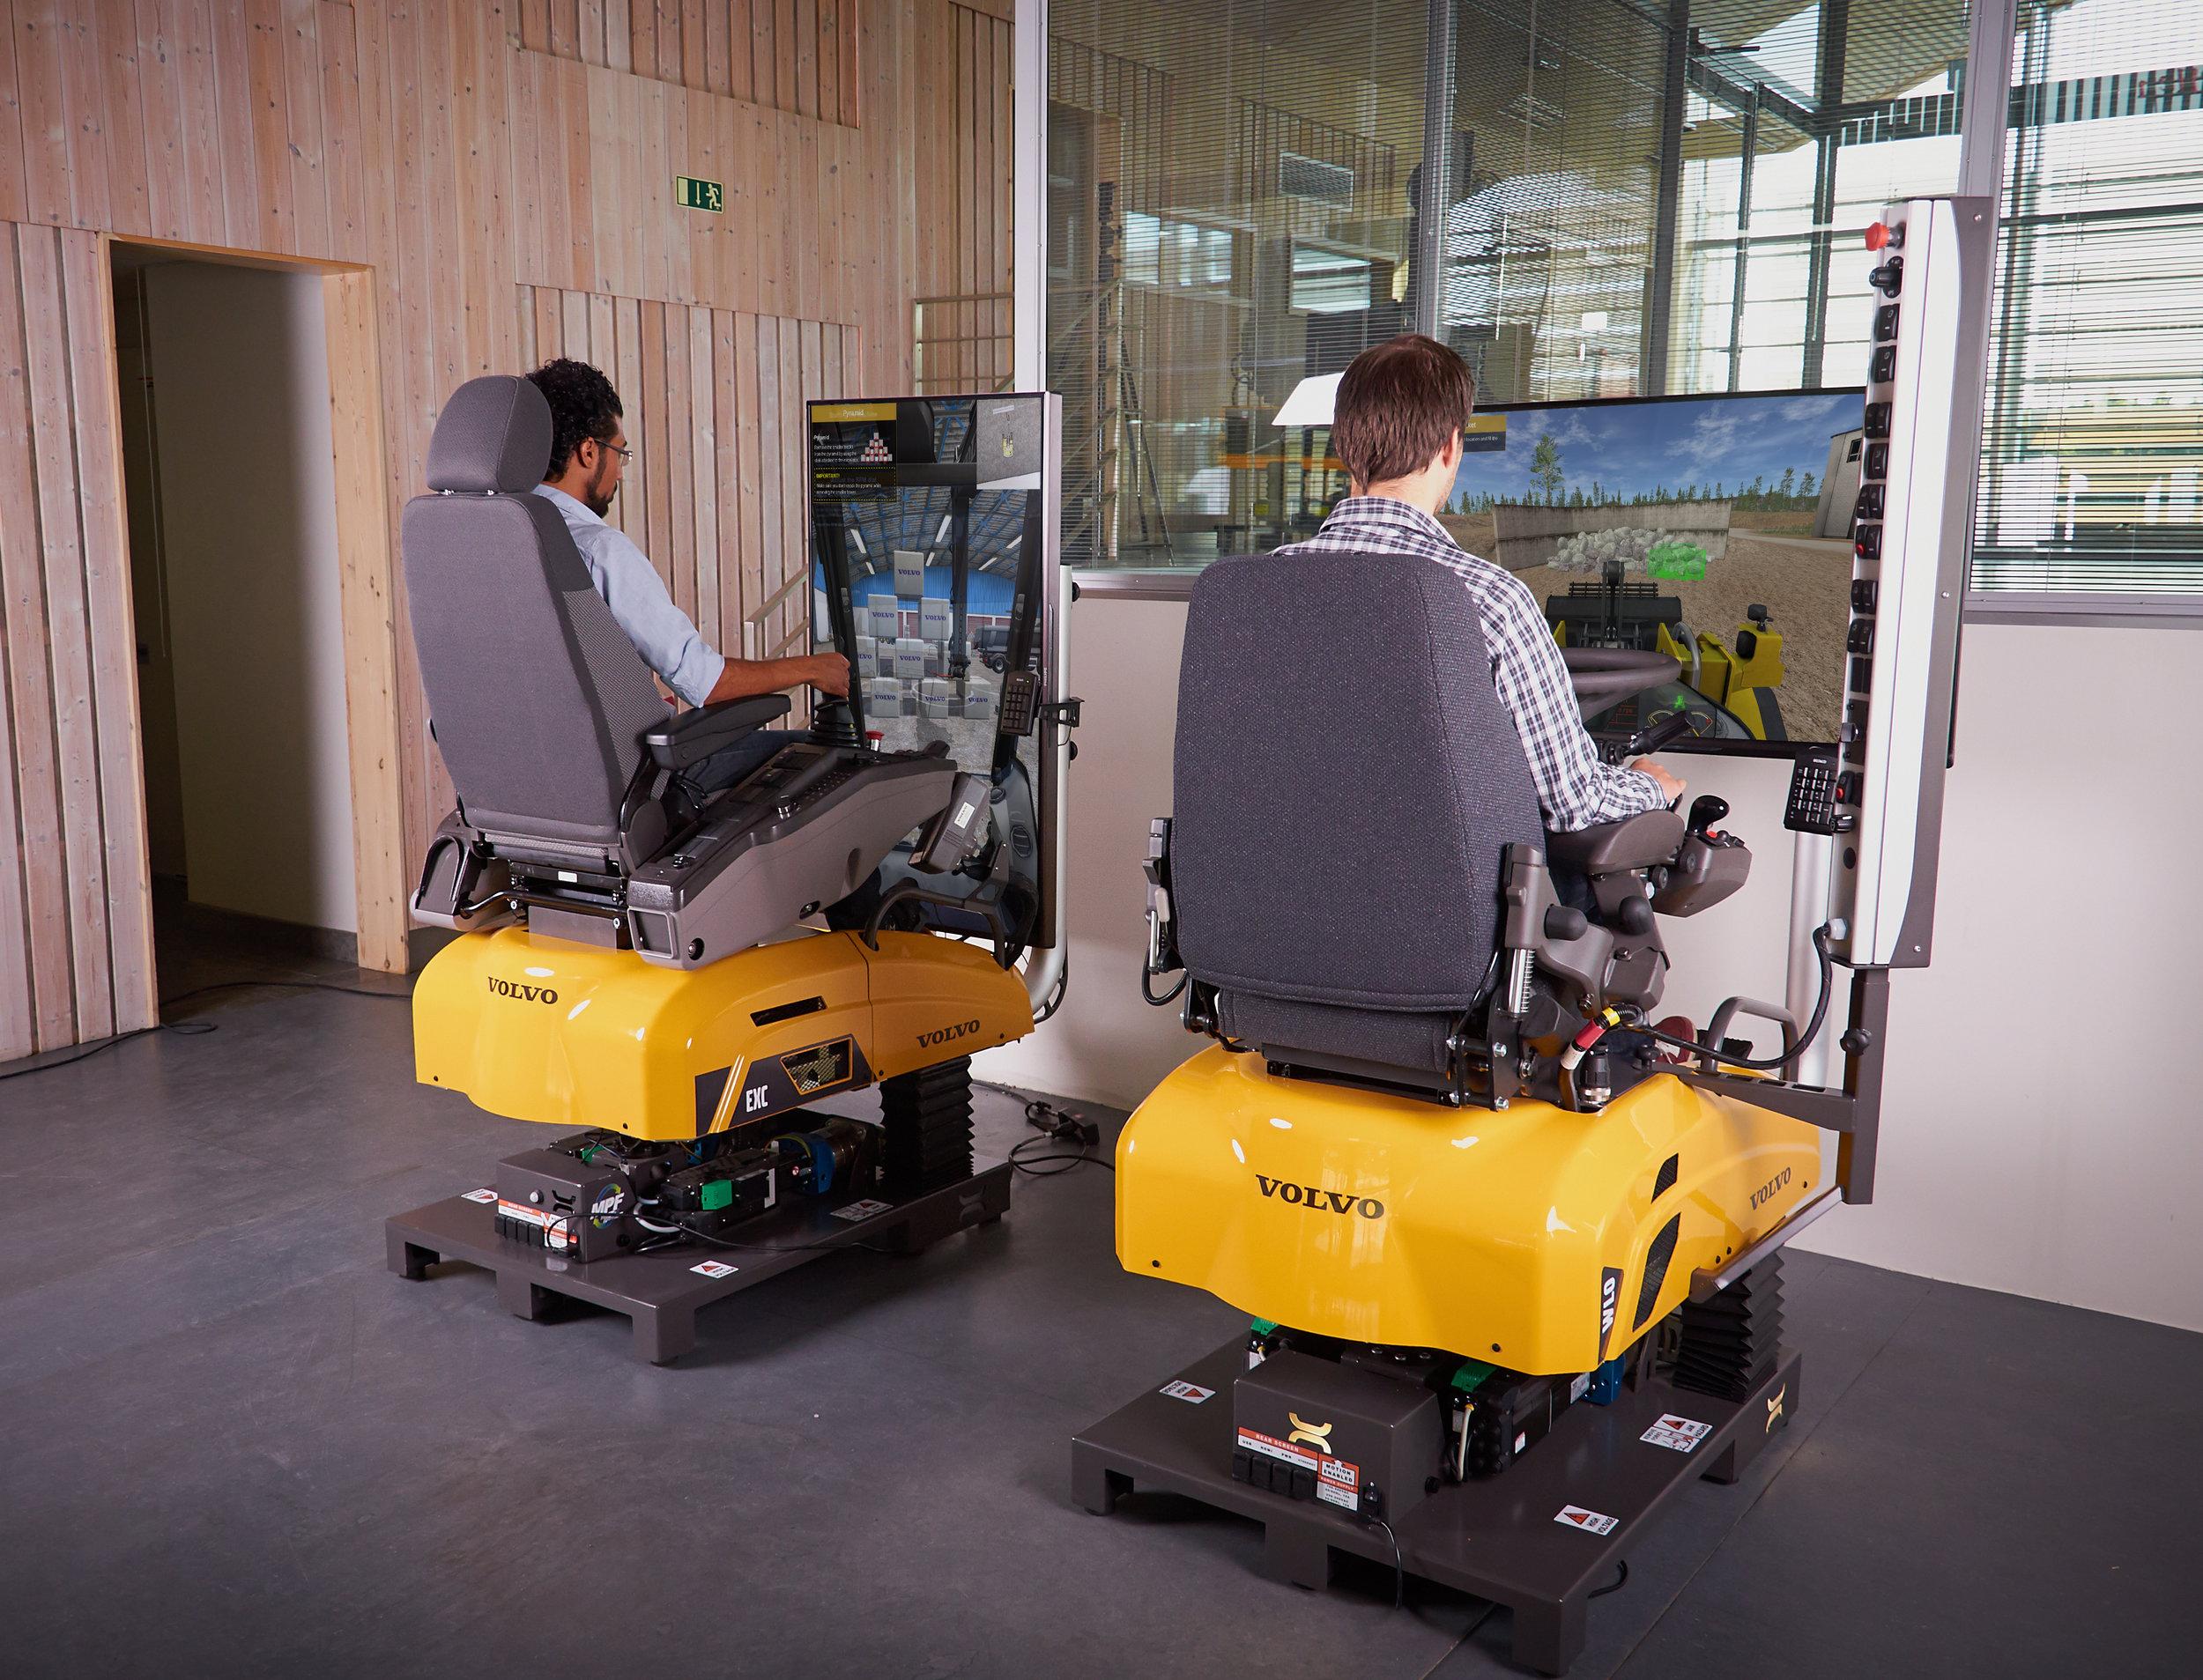 Volvo classroom trainers_01.jpg